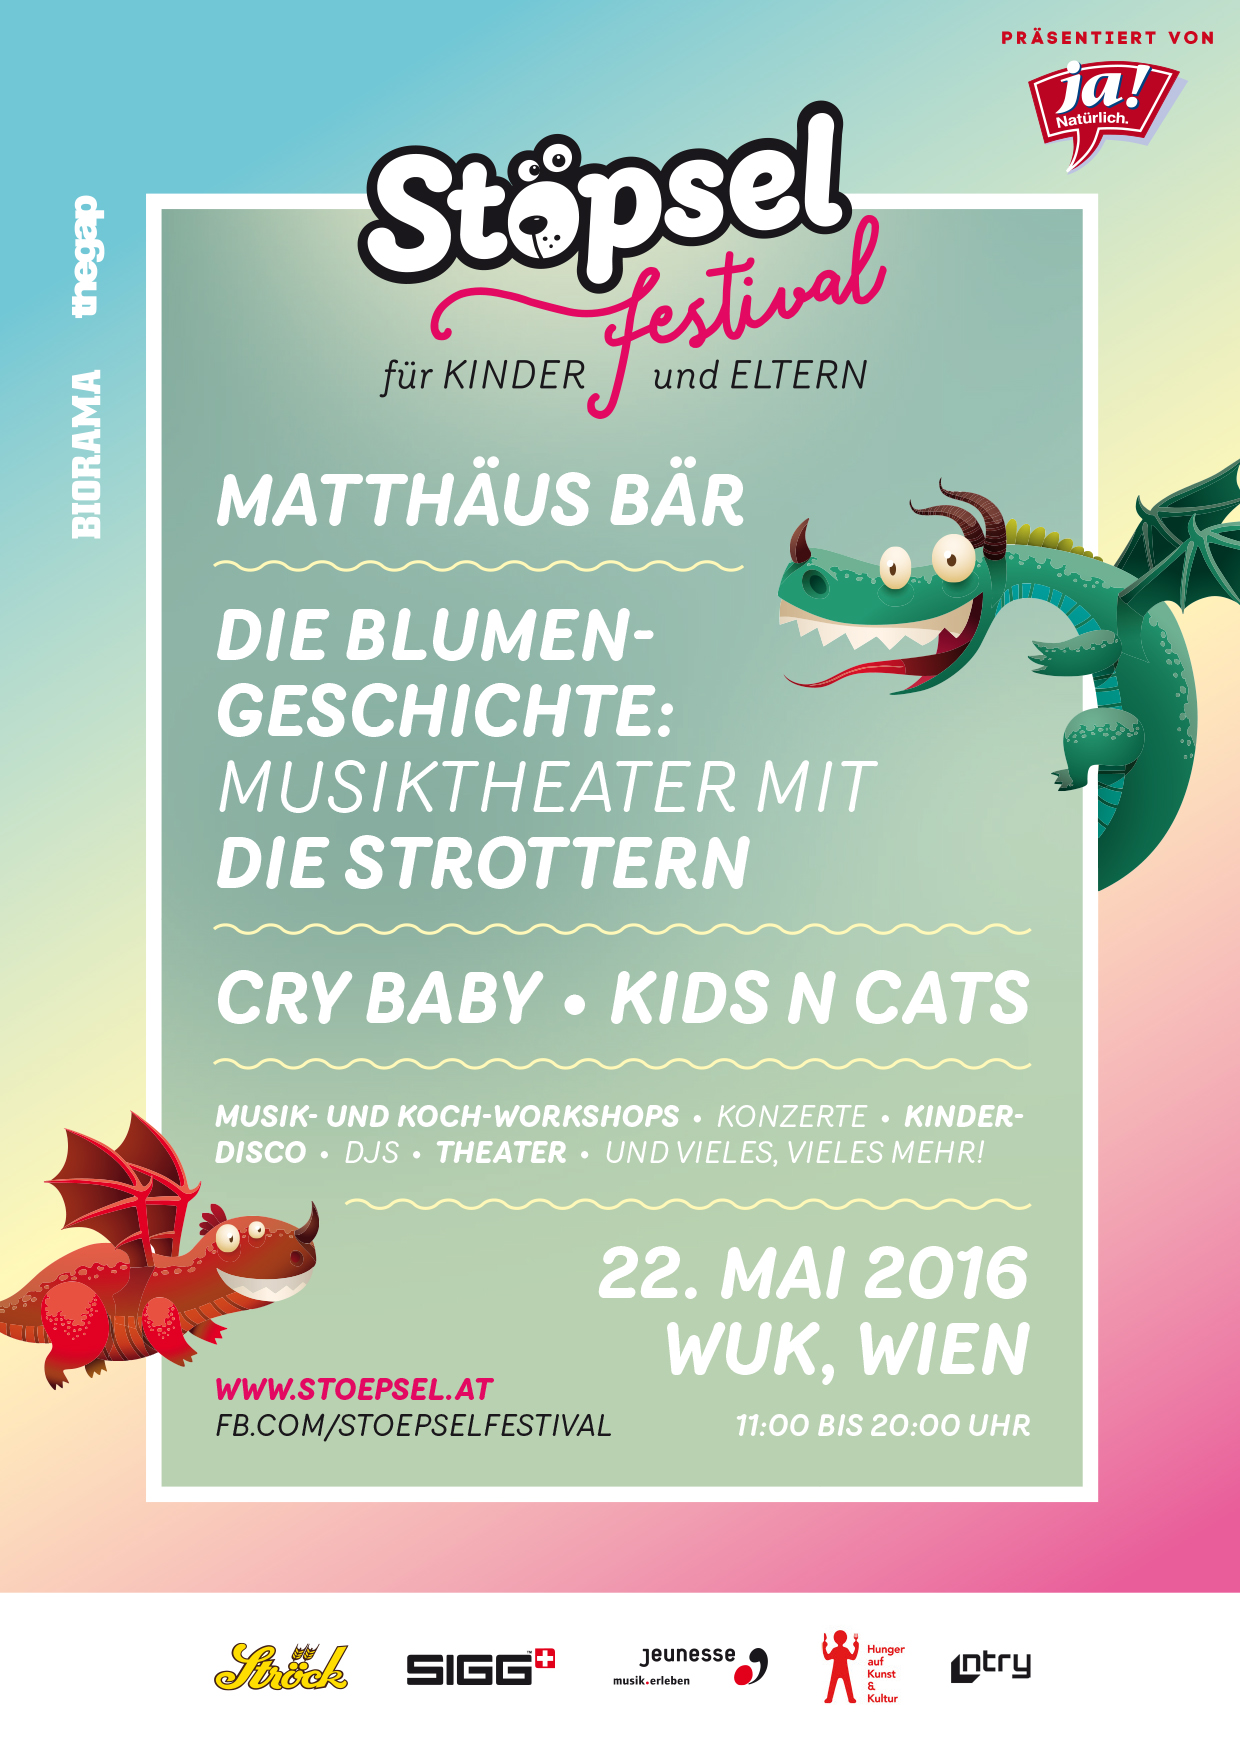 Stöpsel Festival